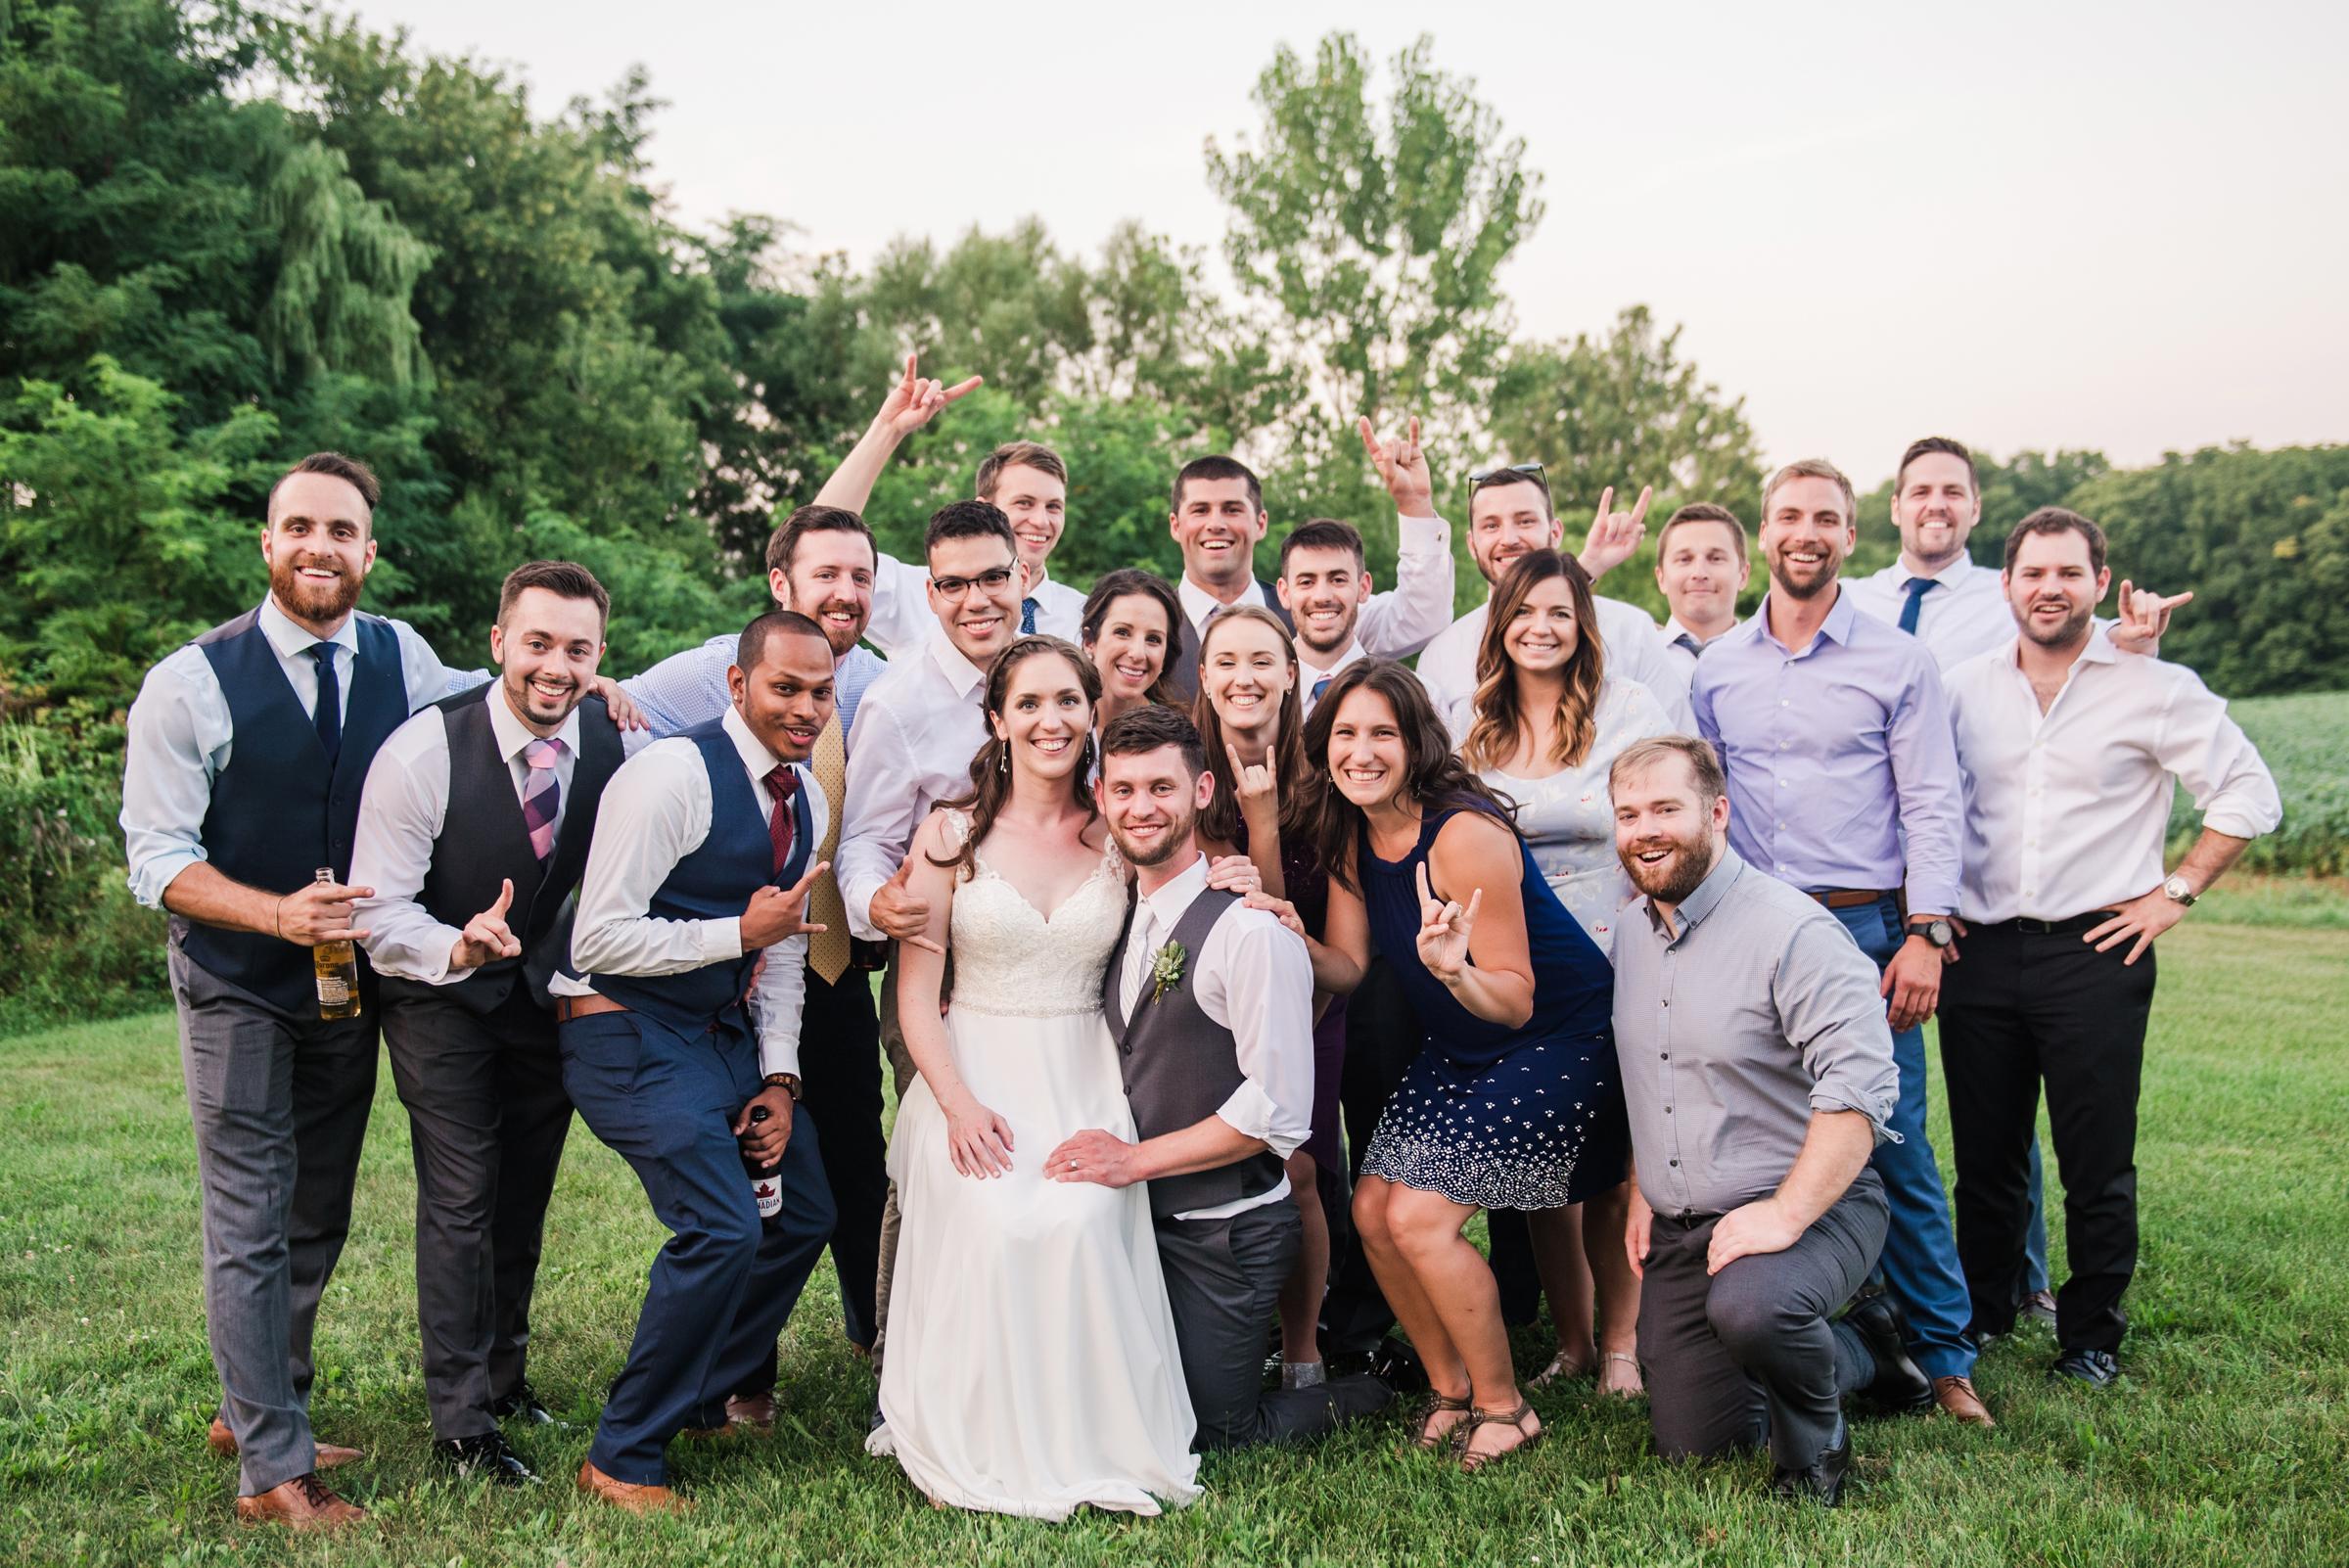 Jerris_Wadsworth_Wedding_Barn_Rochester_Wedding_JILL_STUDIO_Rochester_NY_Photographer_DSC_3136.jpg